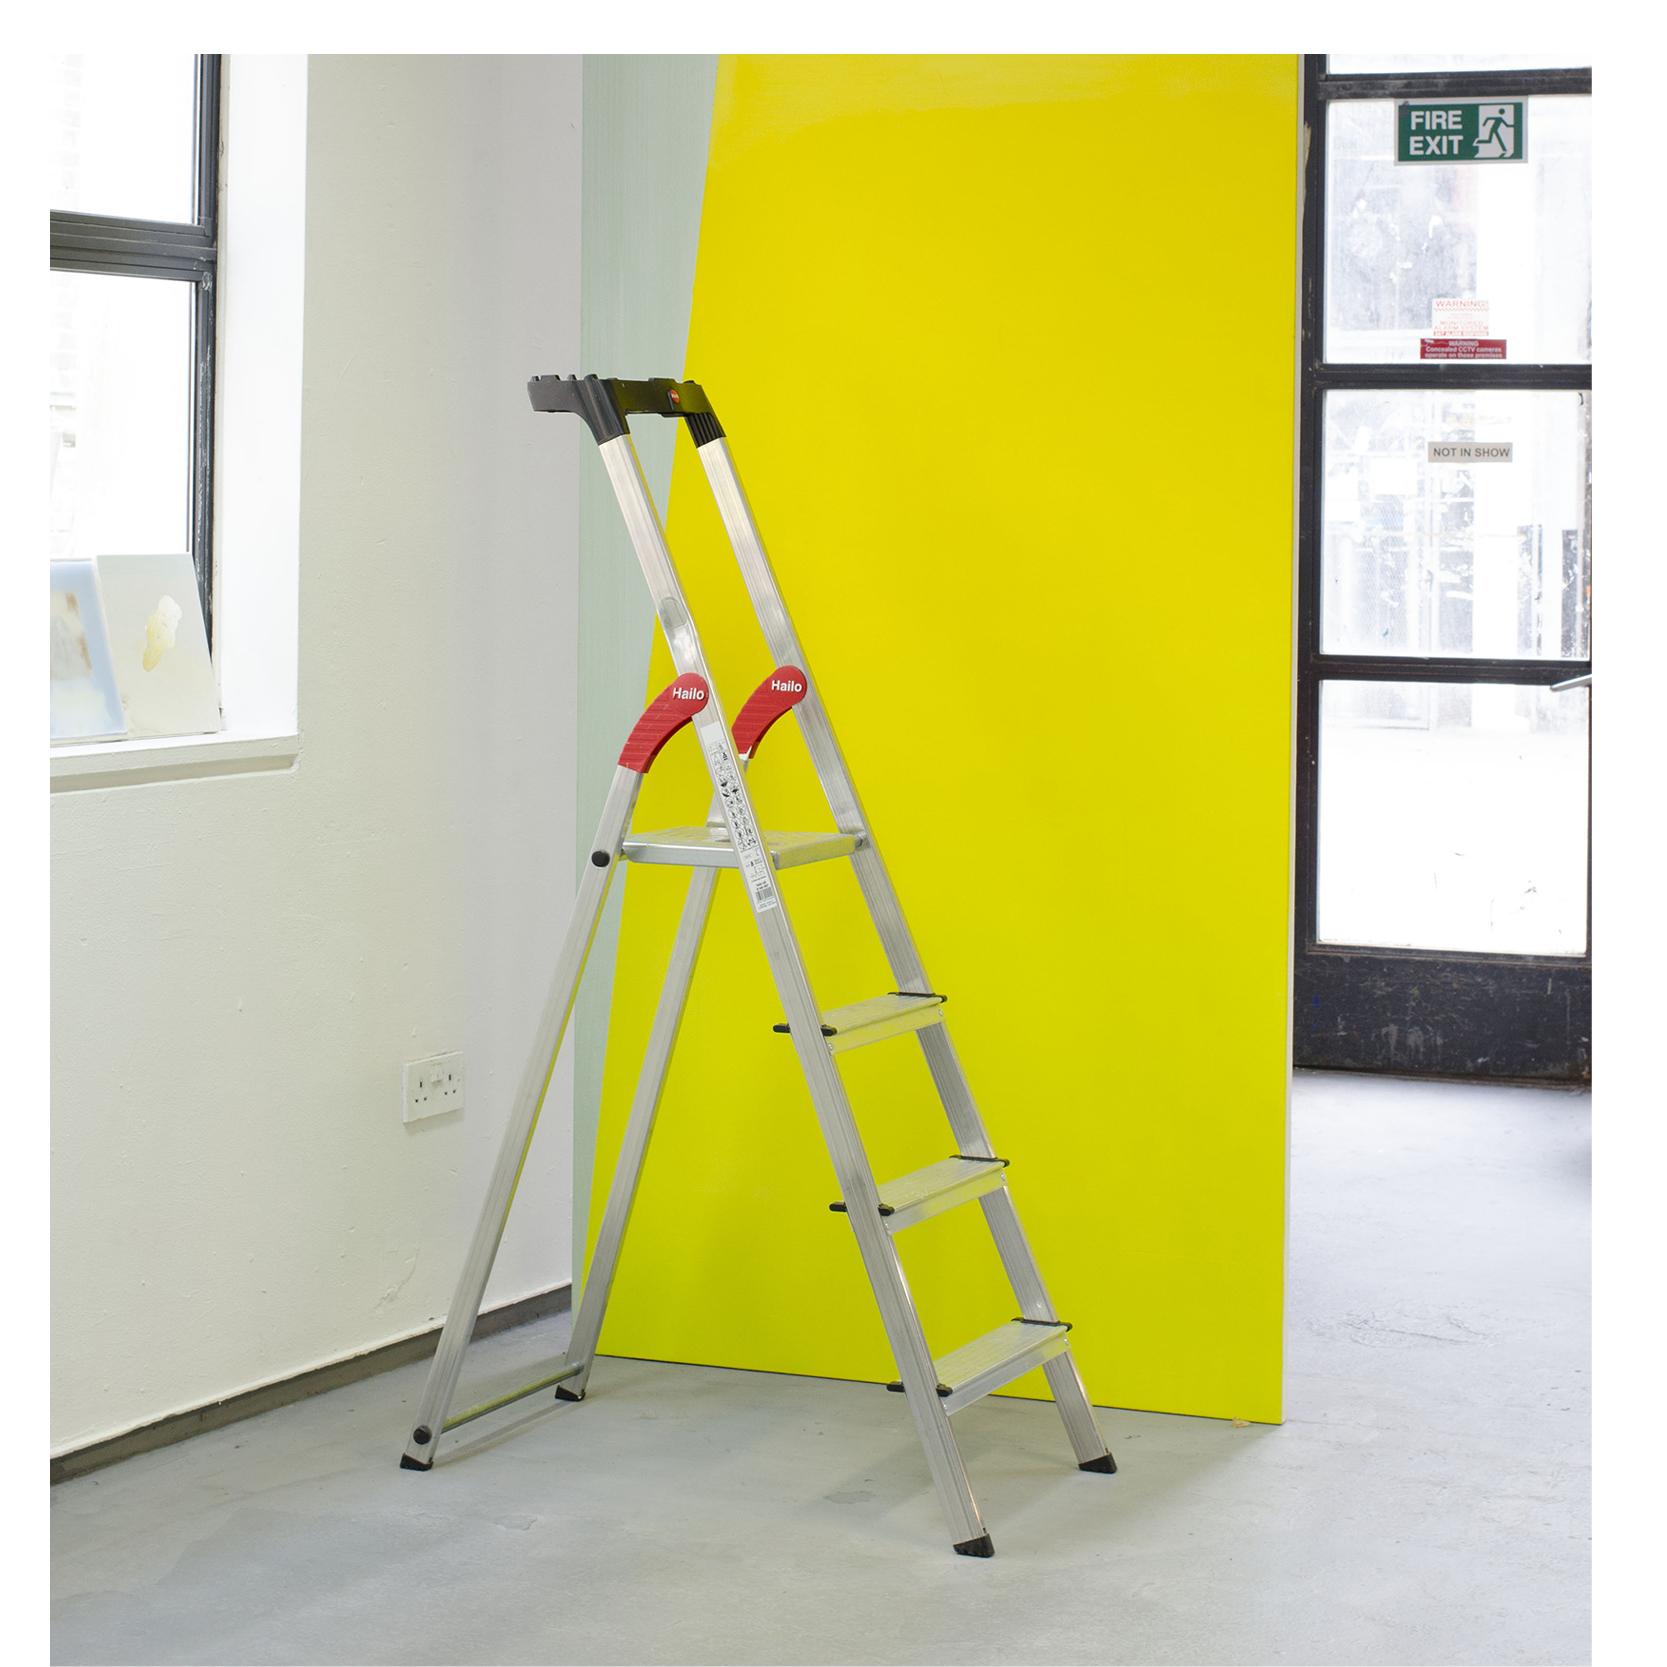 copyright Ahae Kim, A letter A ladder, 2018.